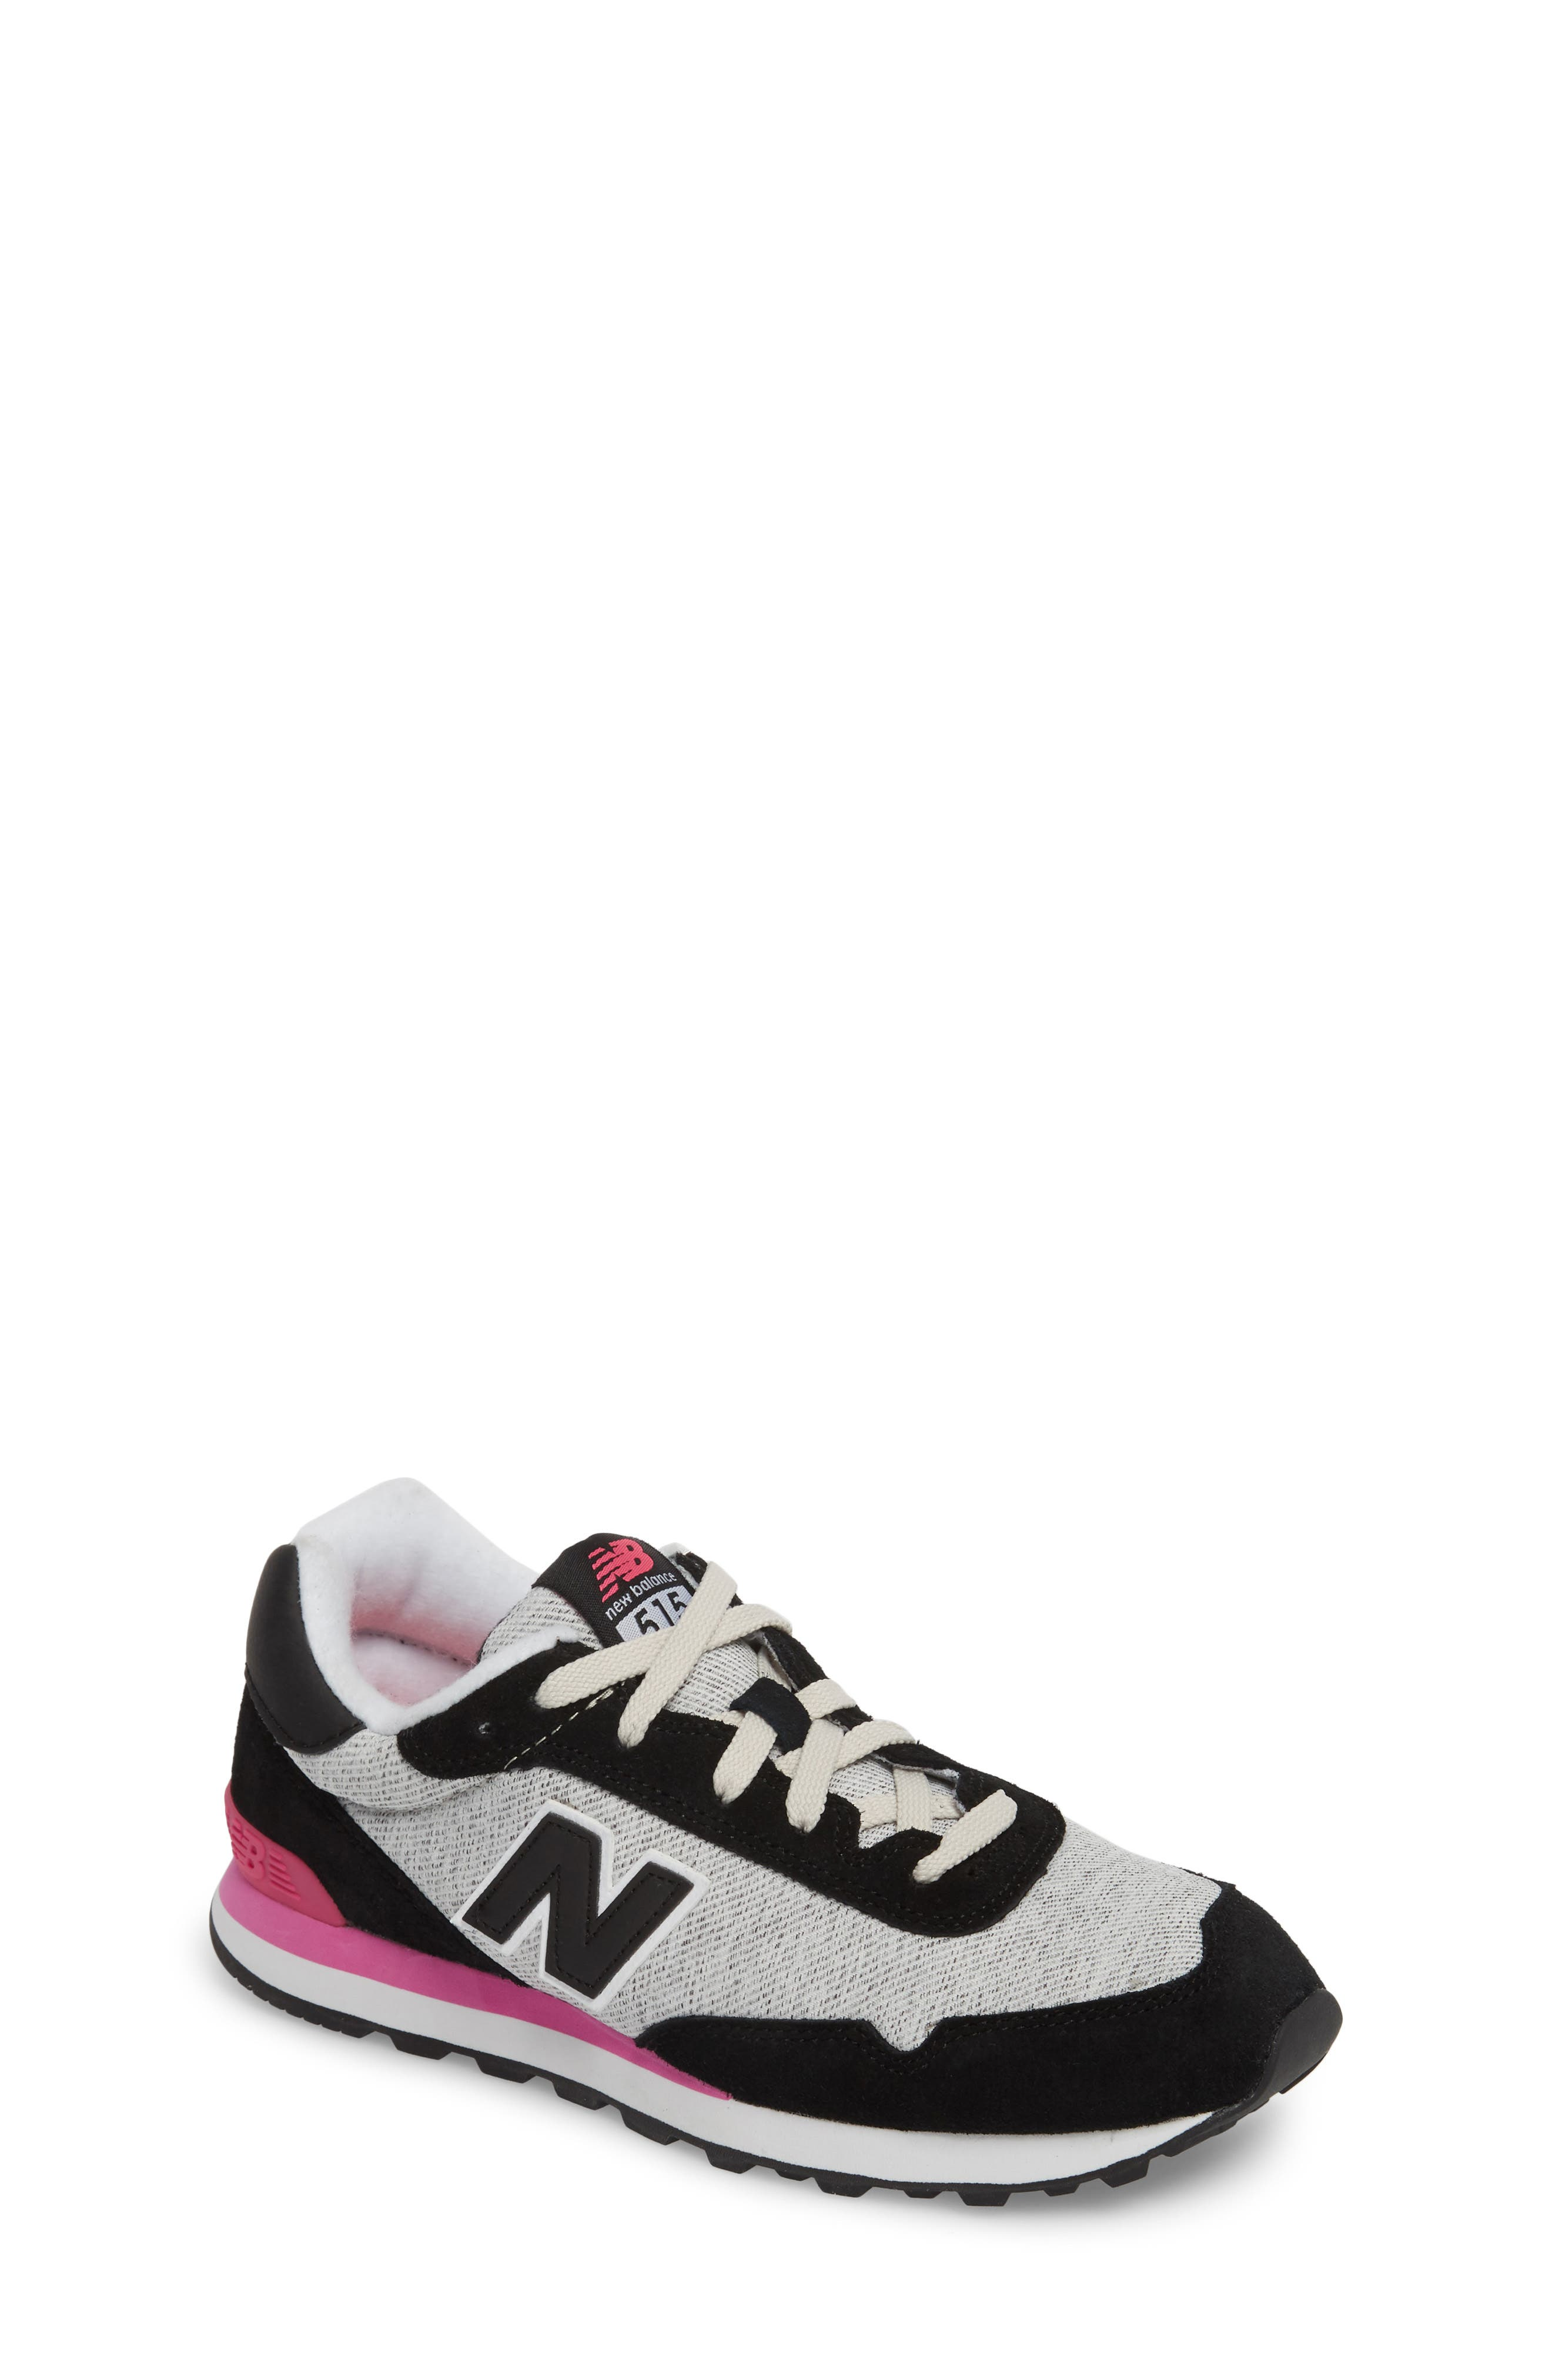 New Balance 515 Sneaker (Baby, Walker, Toddler, Little Kid & Big Kid)